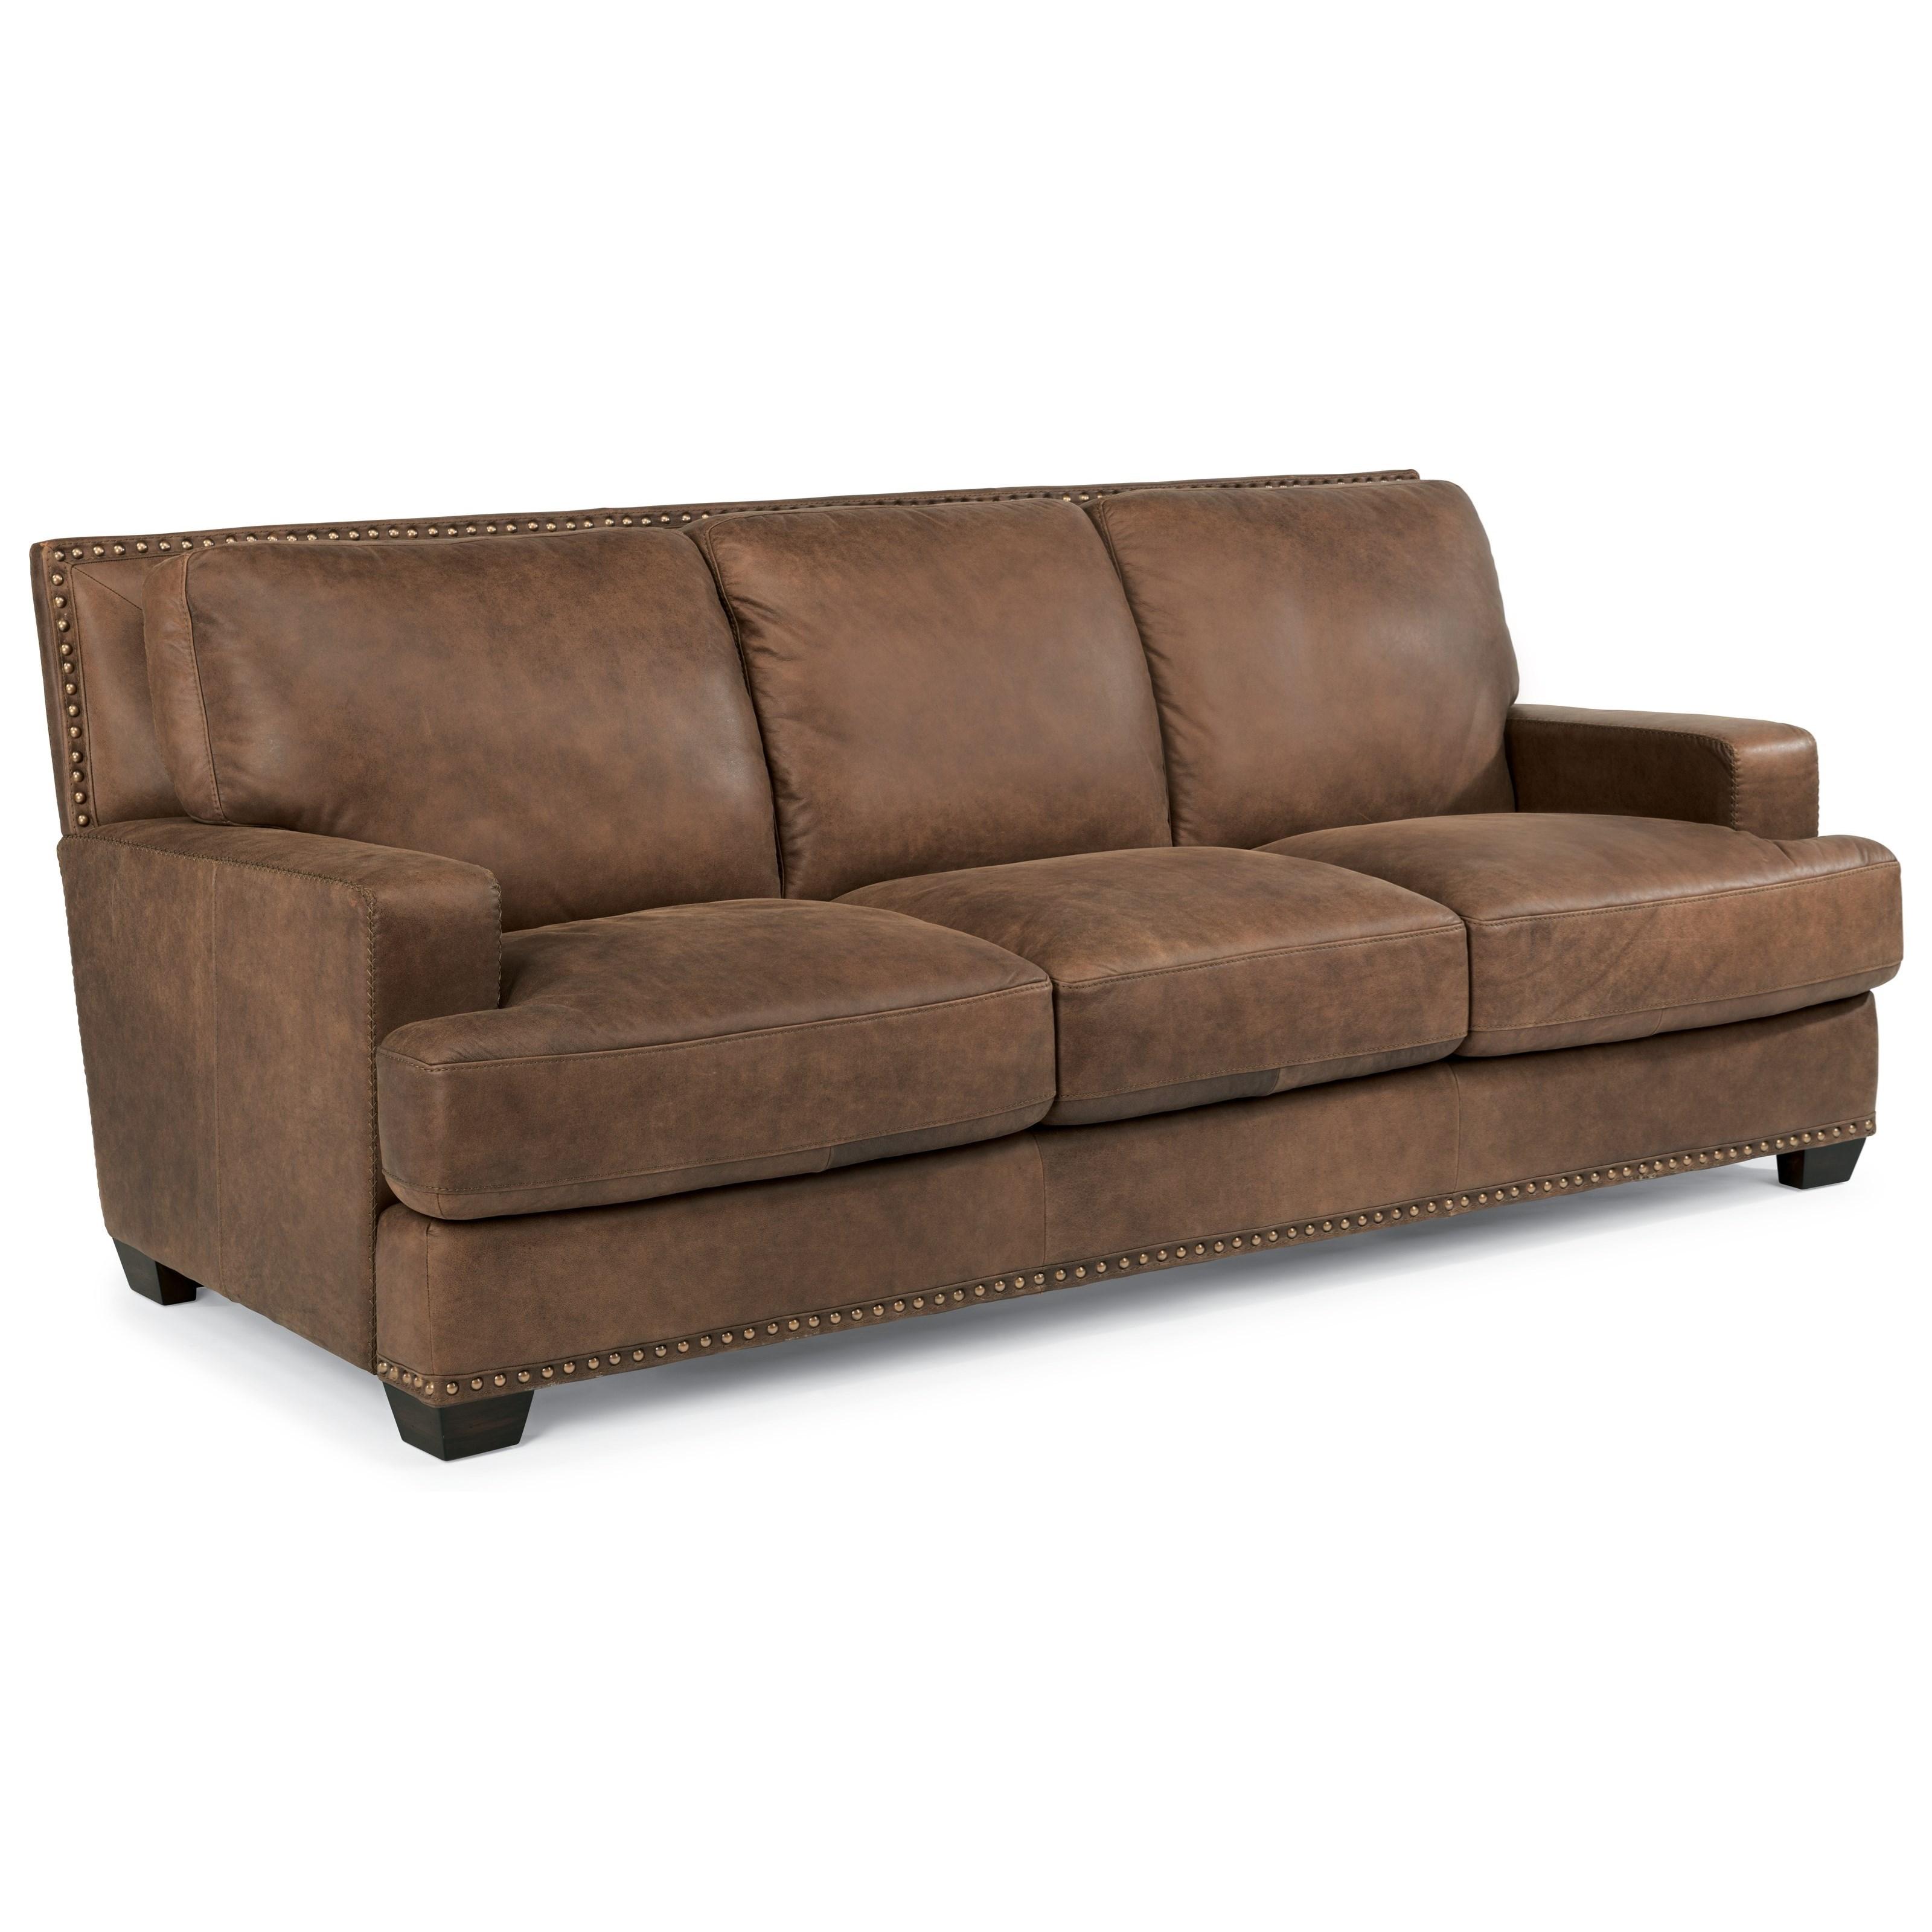 Flexsteel Latitudes-Fremont Leather Sofa  - Item Number: 1324-31